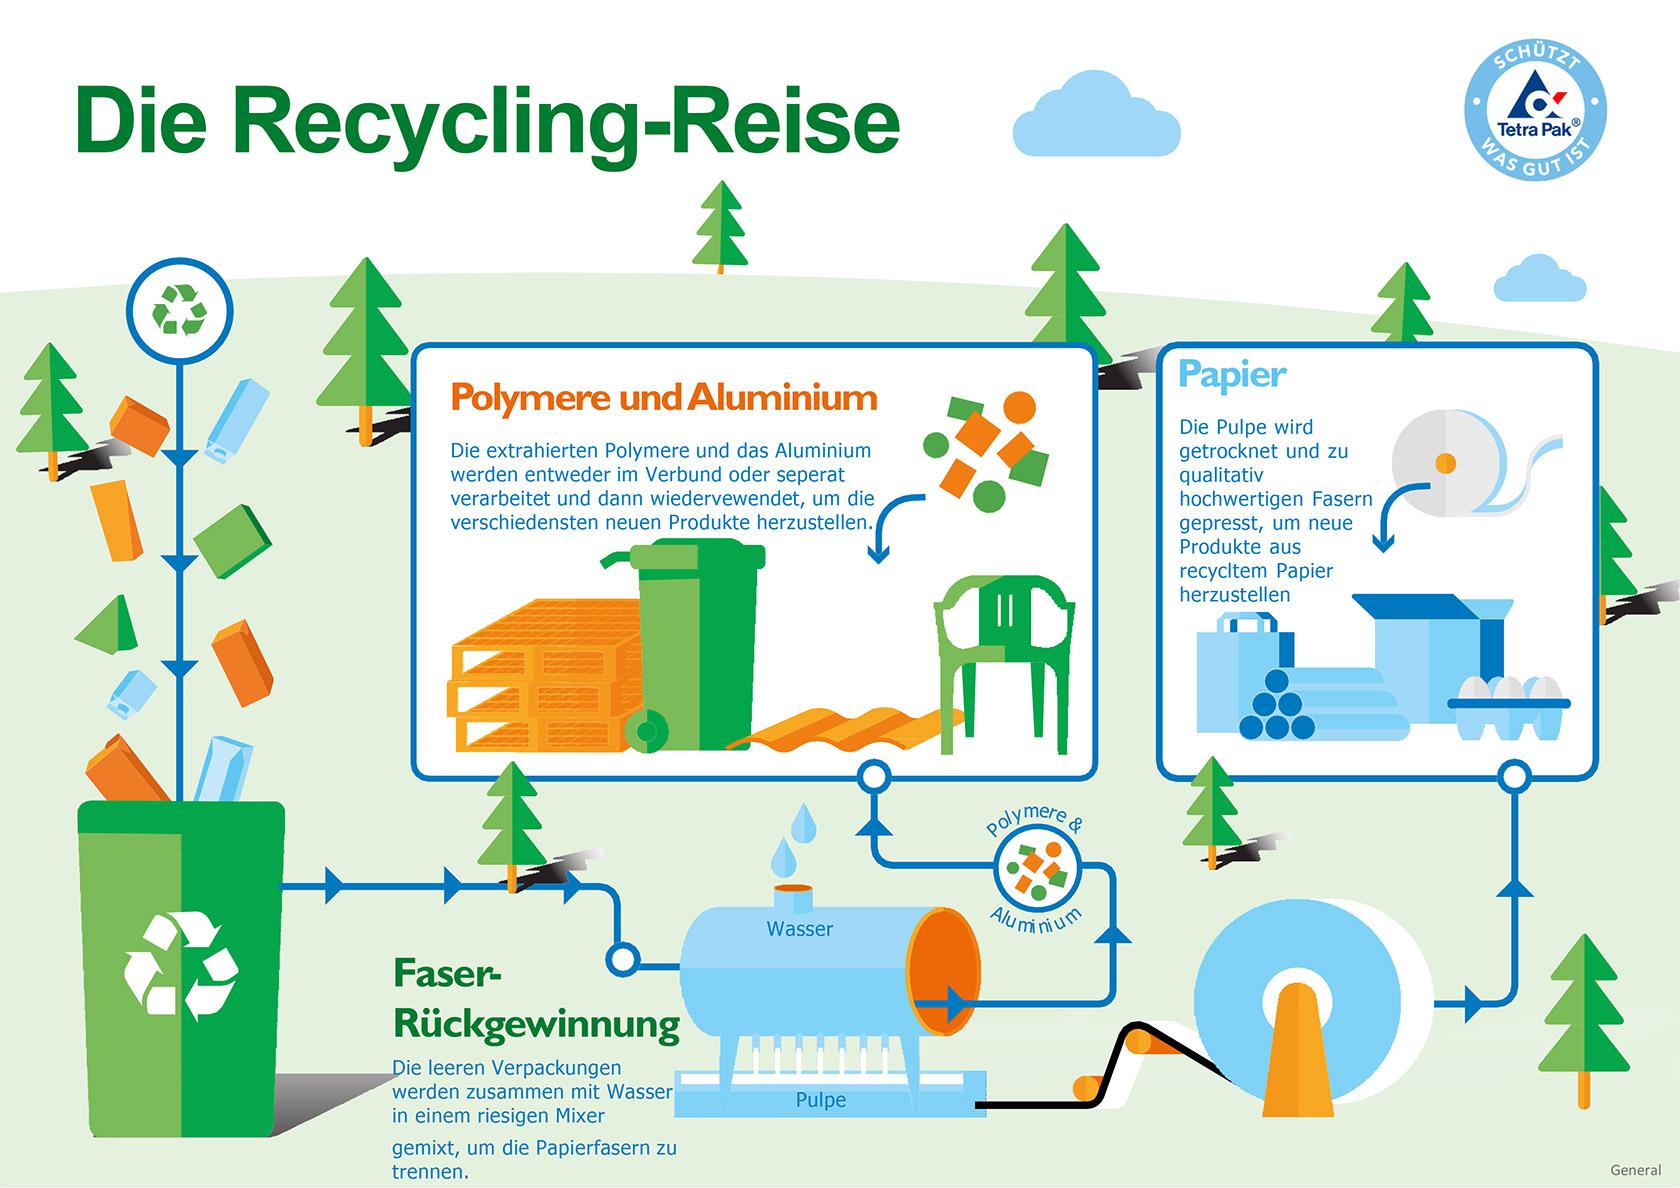 Die Tetra Pak Recycling-Reise